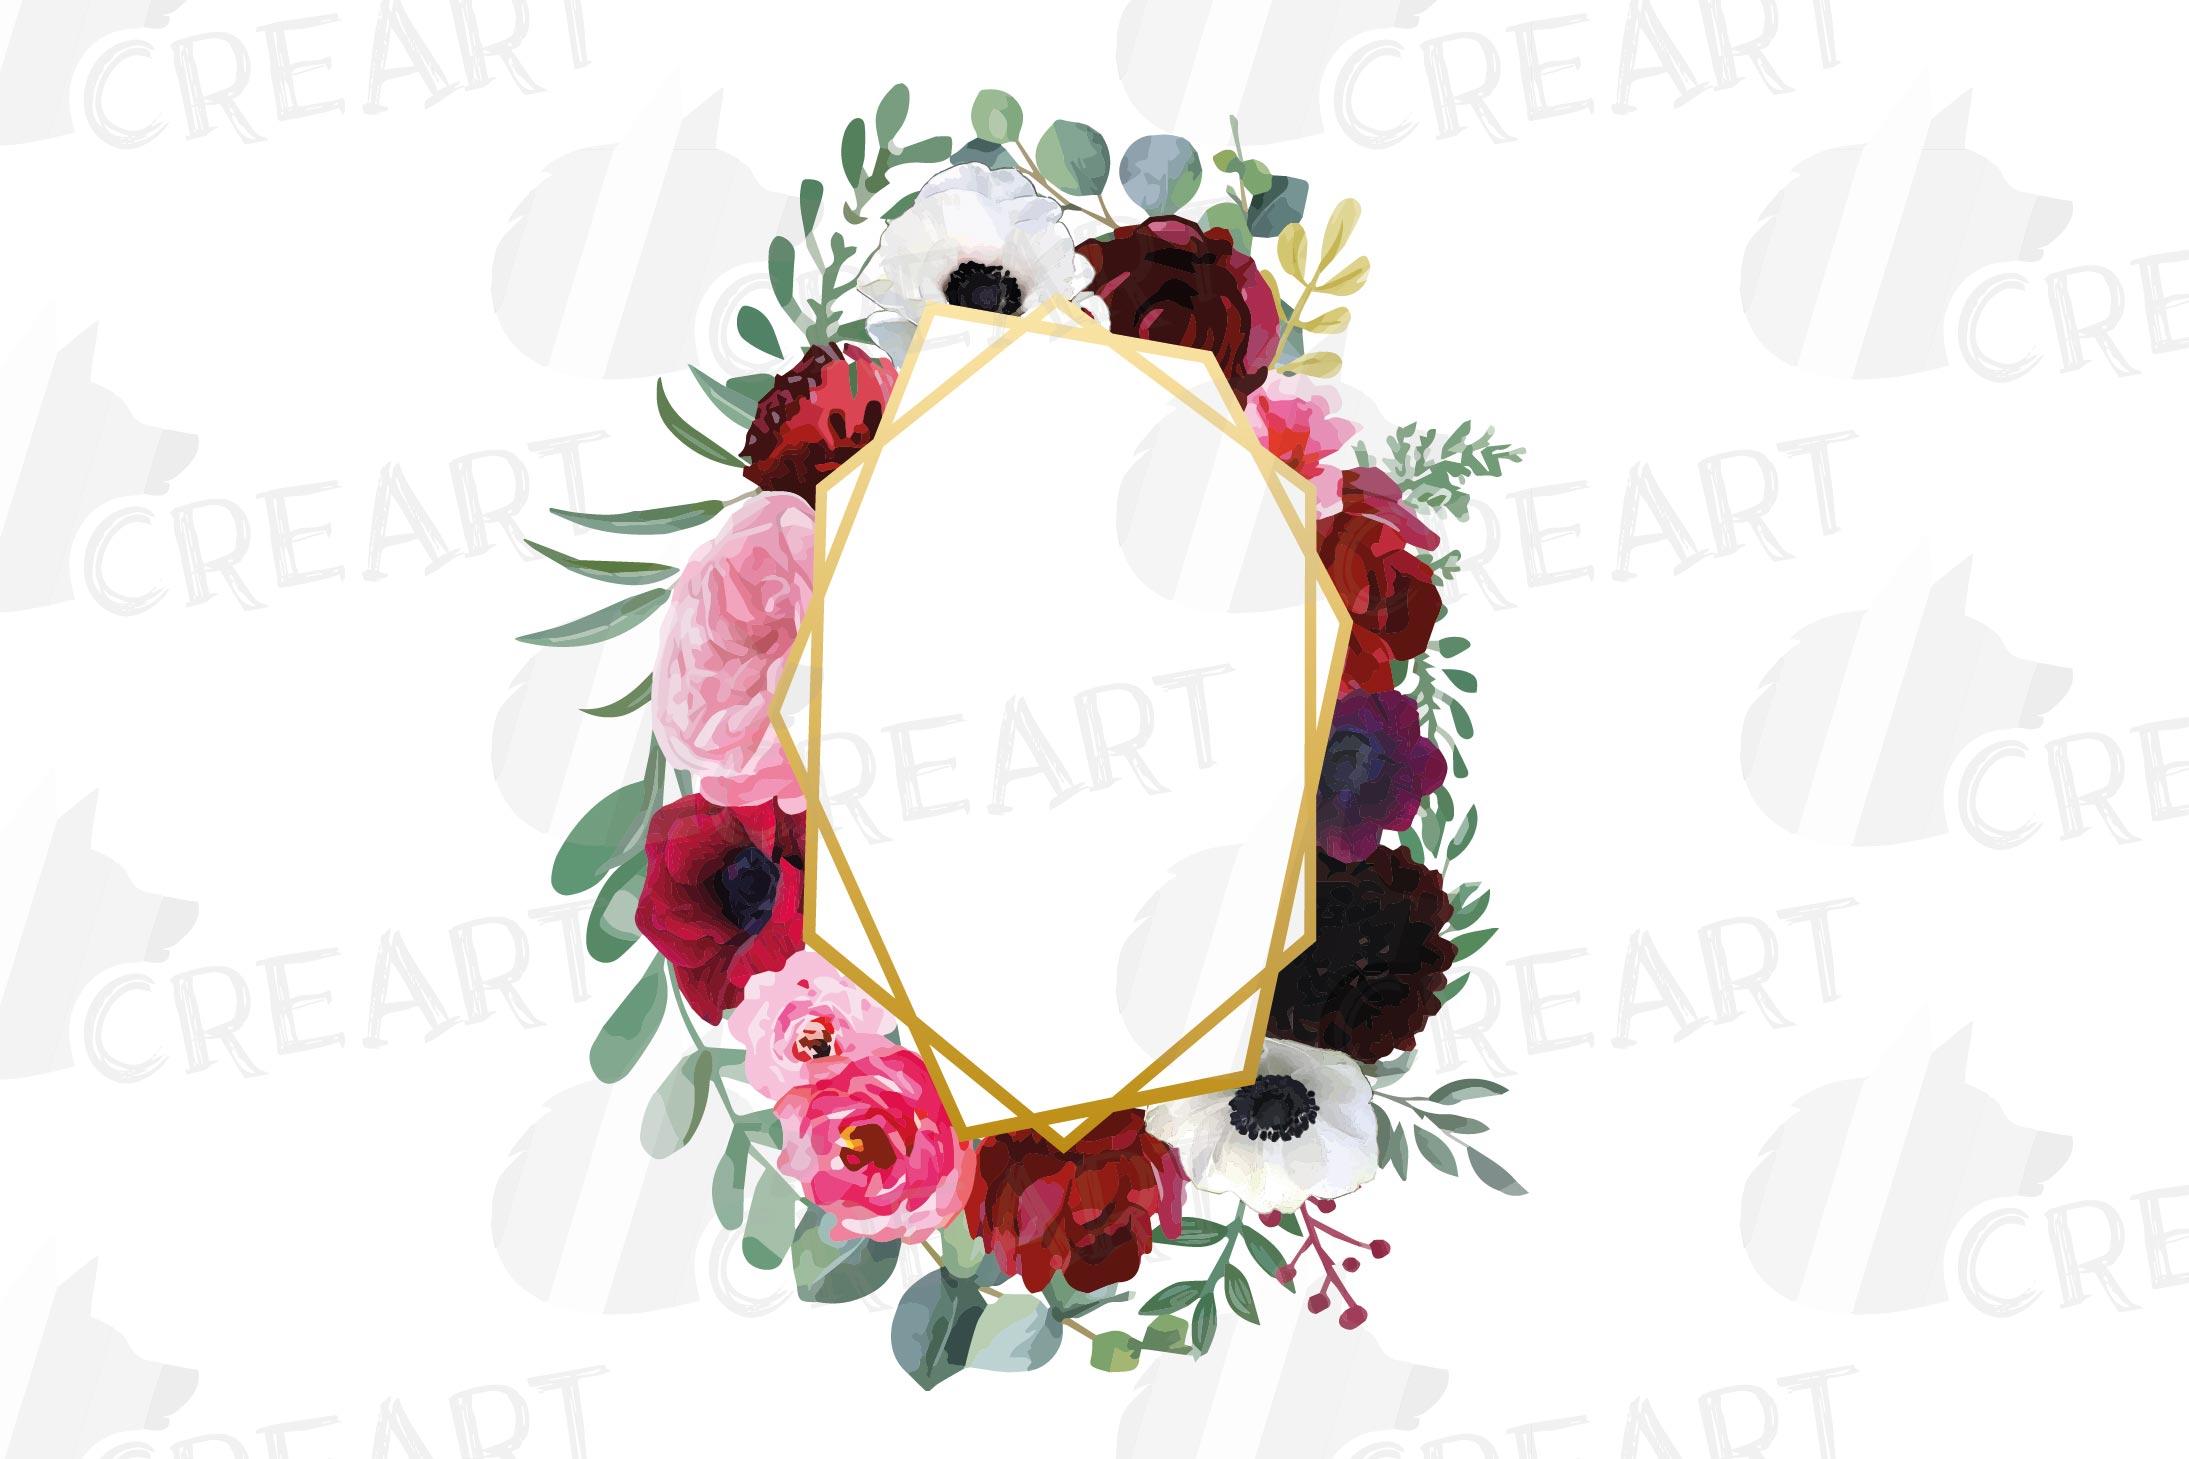 Watercolor elegant floral borders, rose, anemone frames example image 6